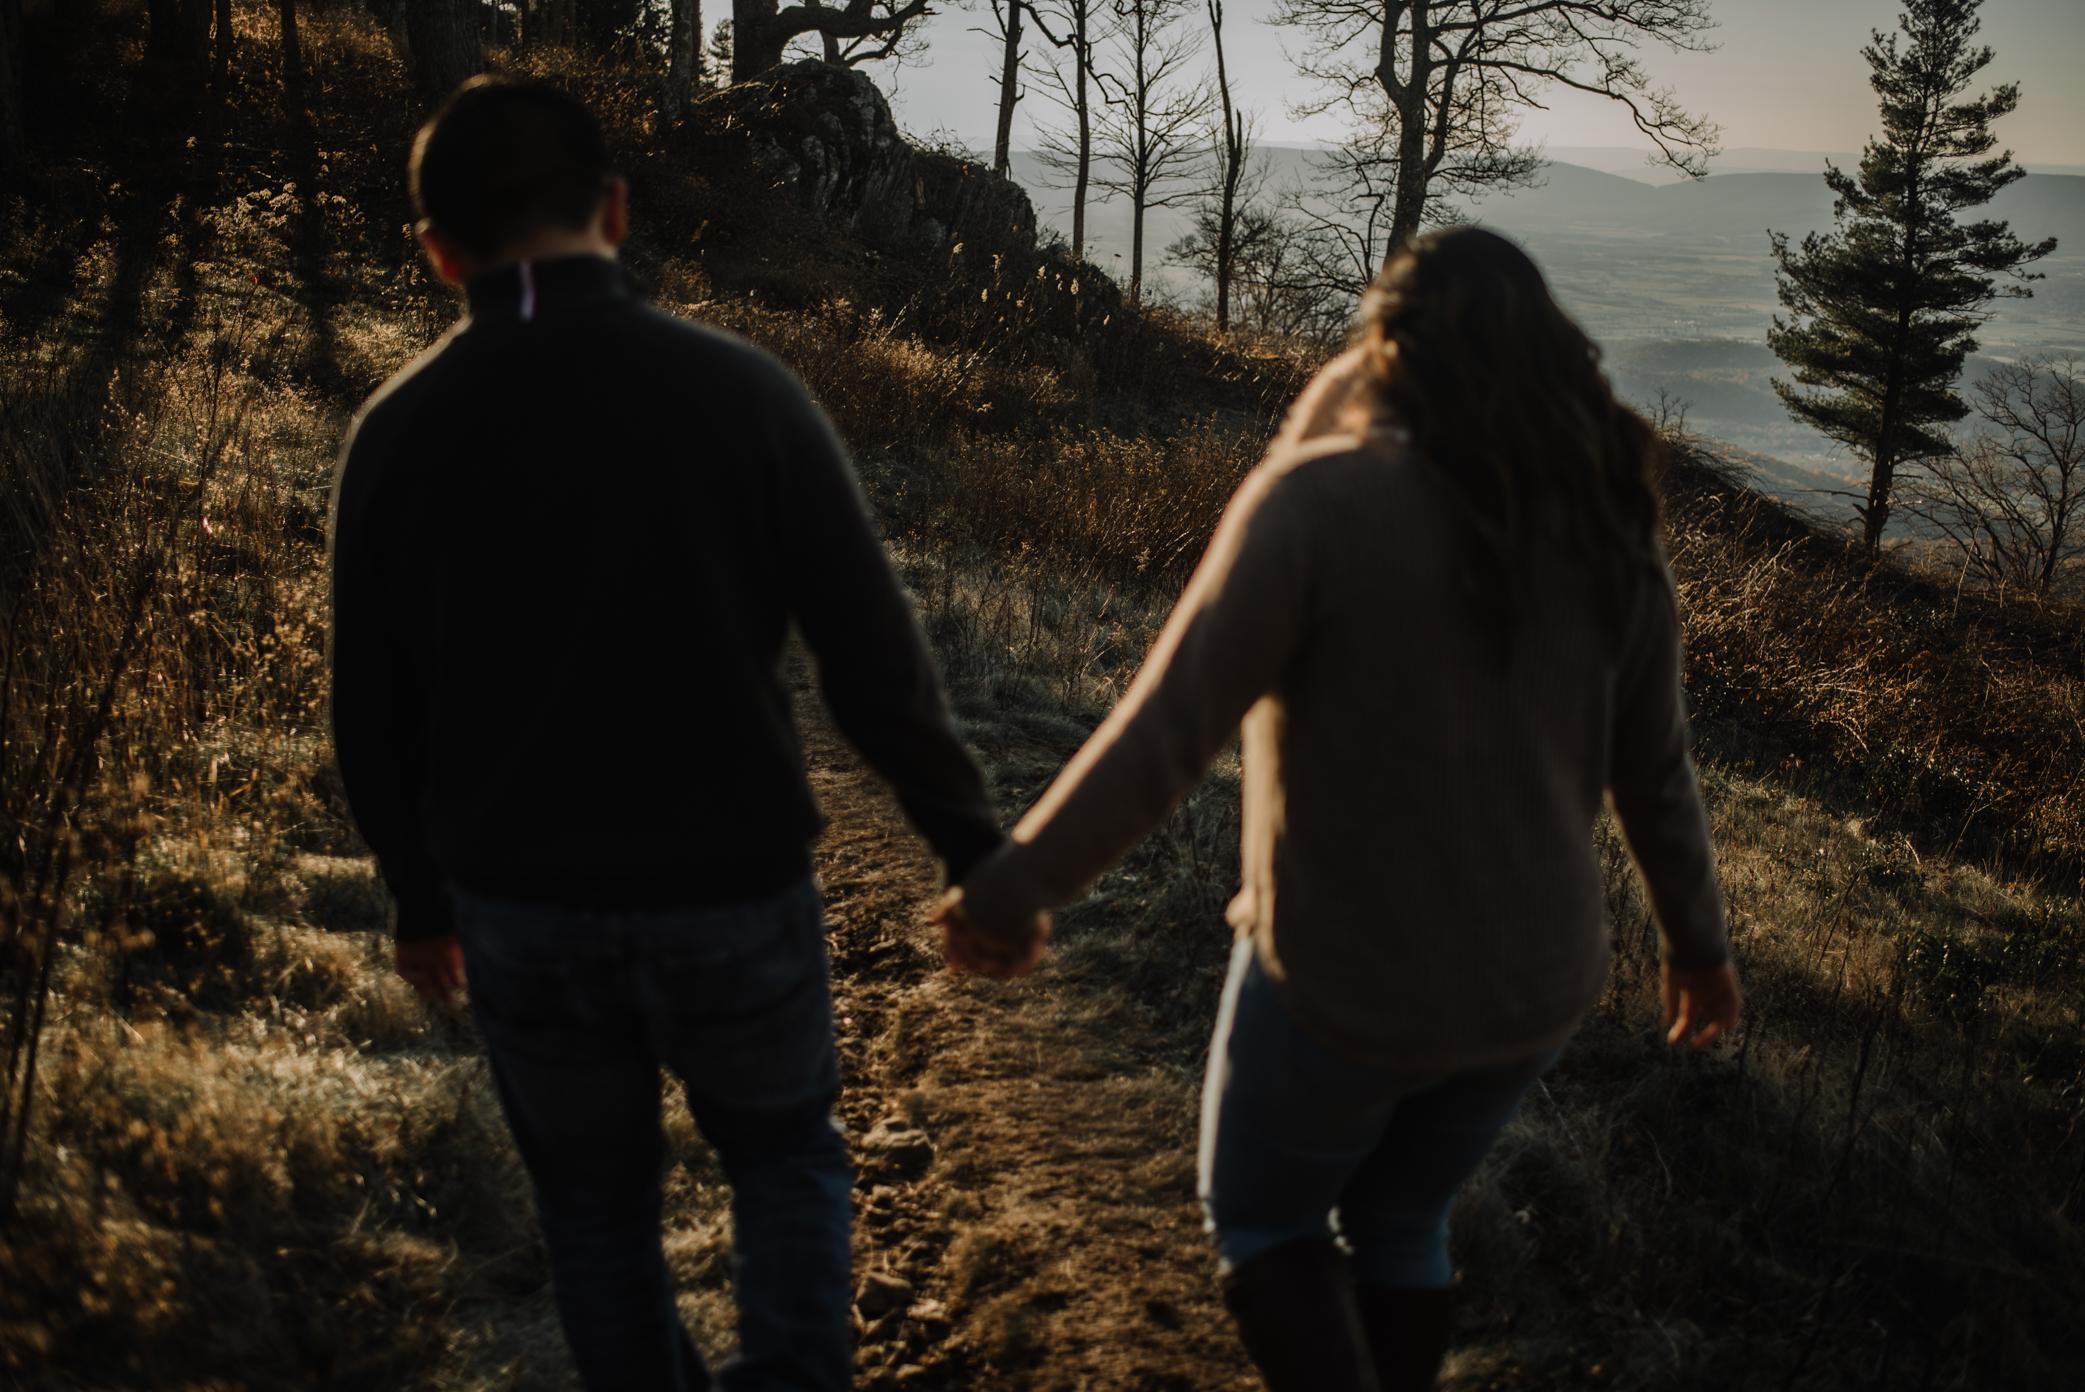 Joshua and Kristina - Shenandoah National Park - Skyline Drive - Winter Engagement Session Photographer - White Sails Creative_17.JPG